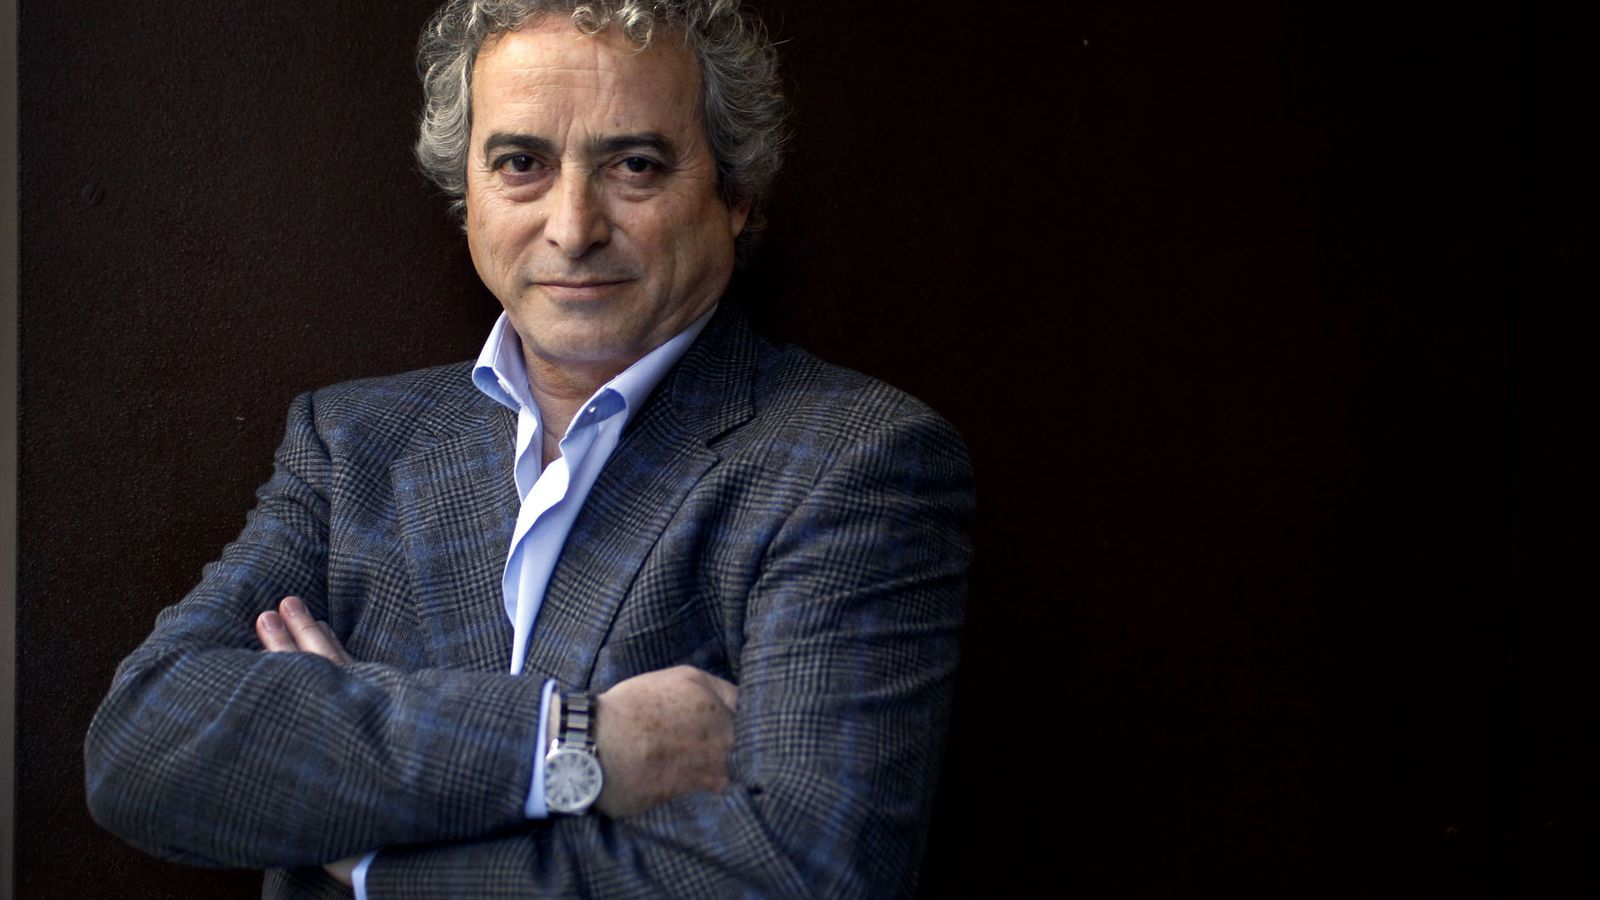 La pròxima novel·la d'Ildefonso Falcones s'endinsarà en la Barcelona modernista